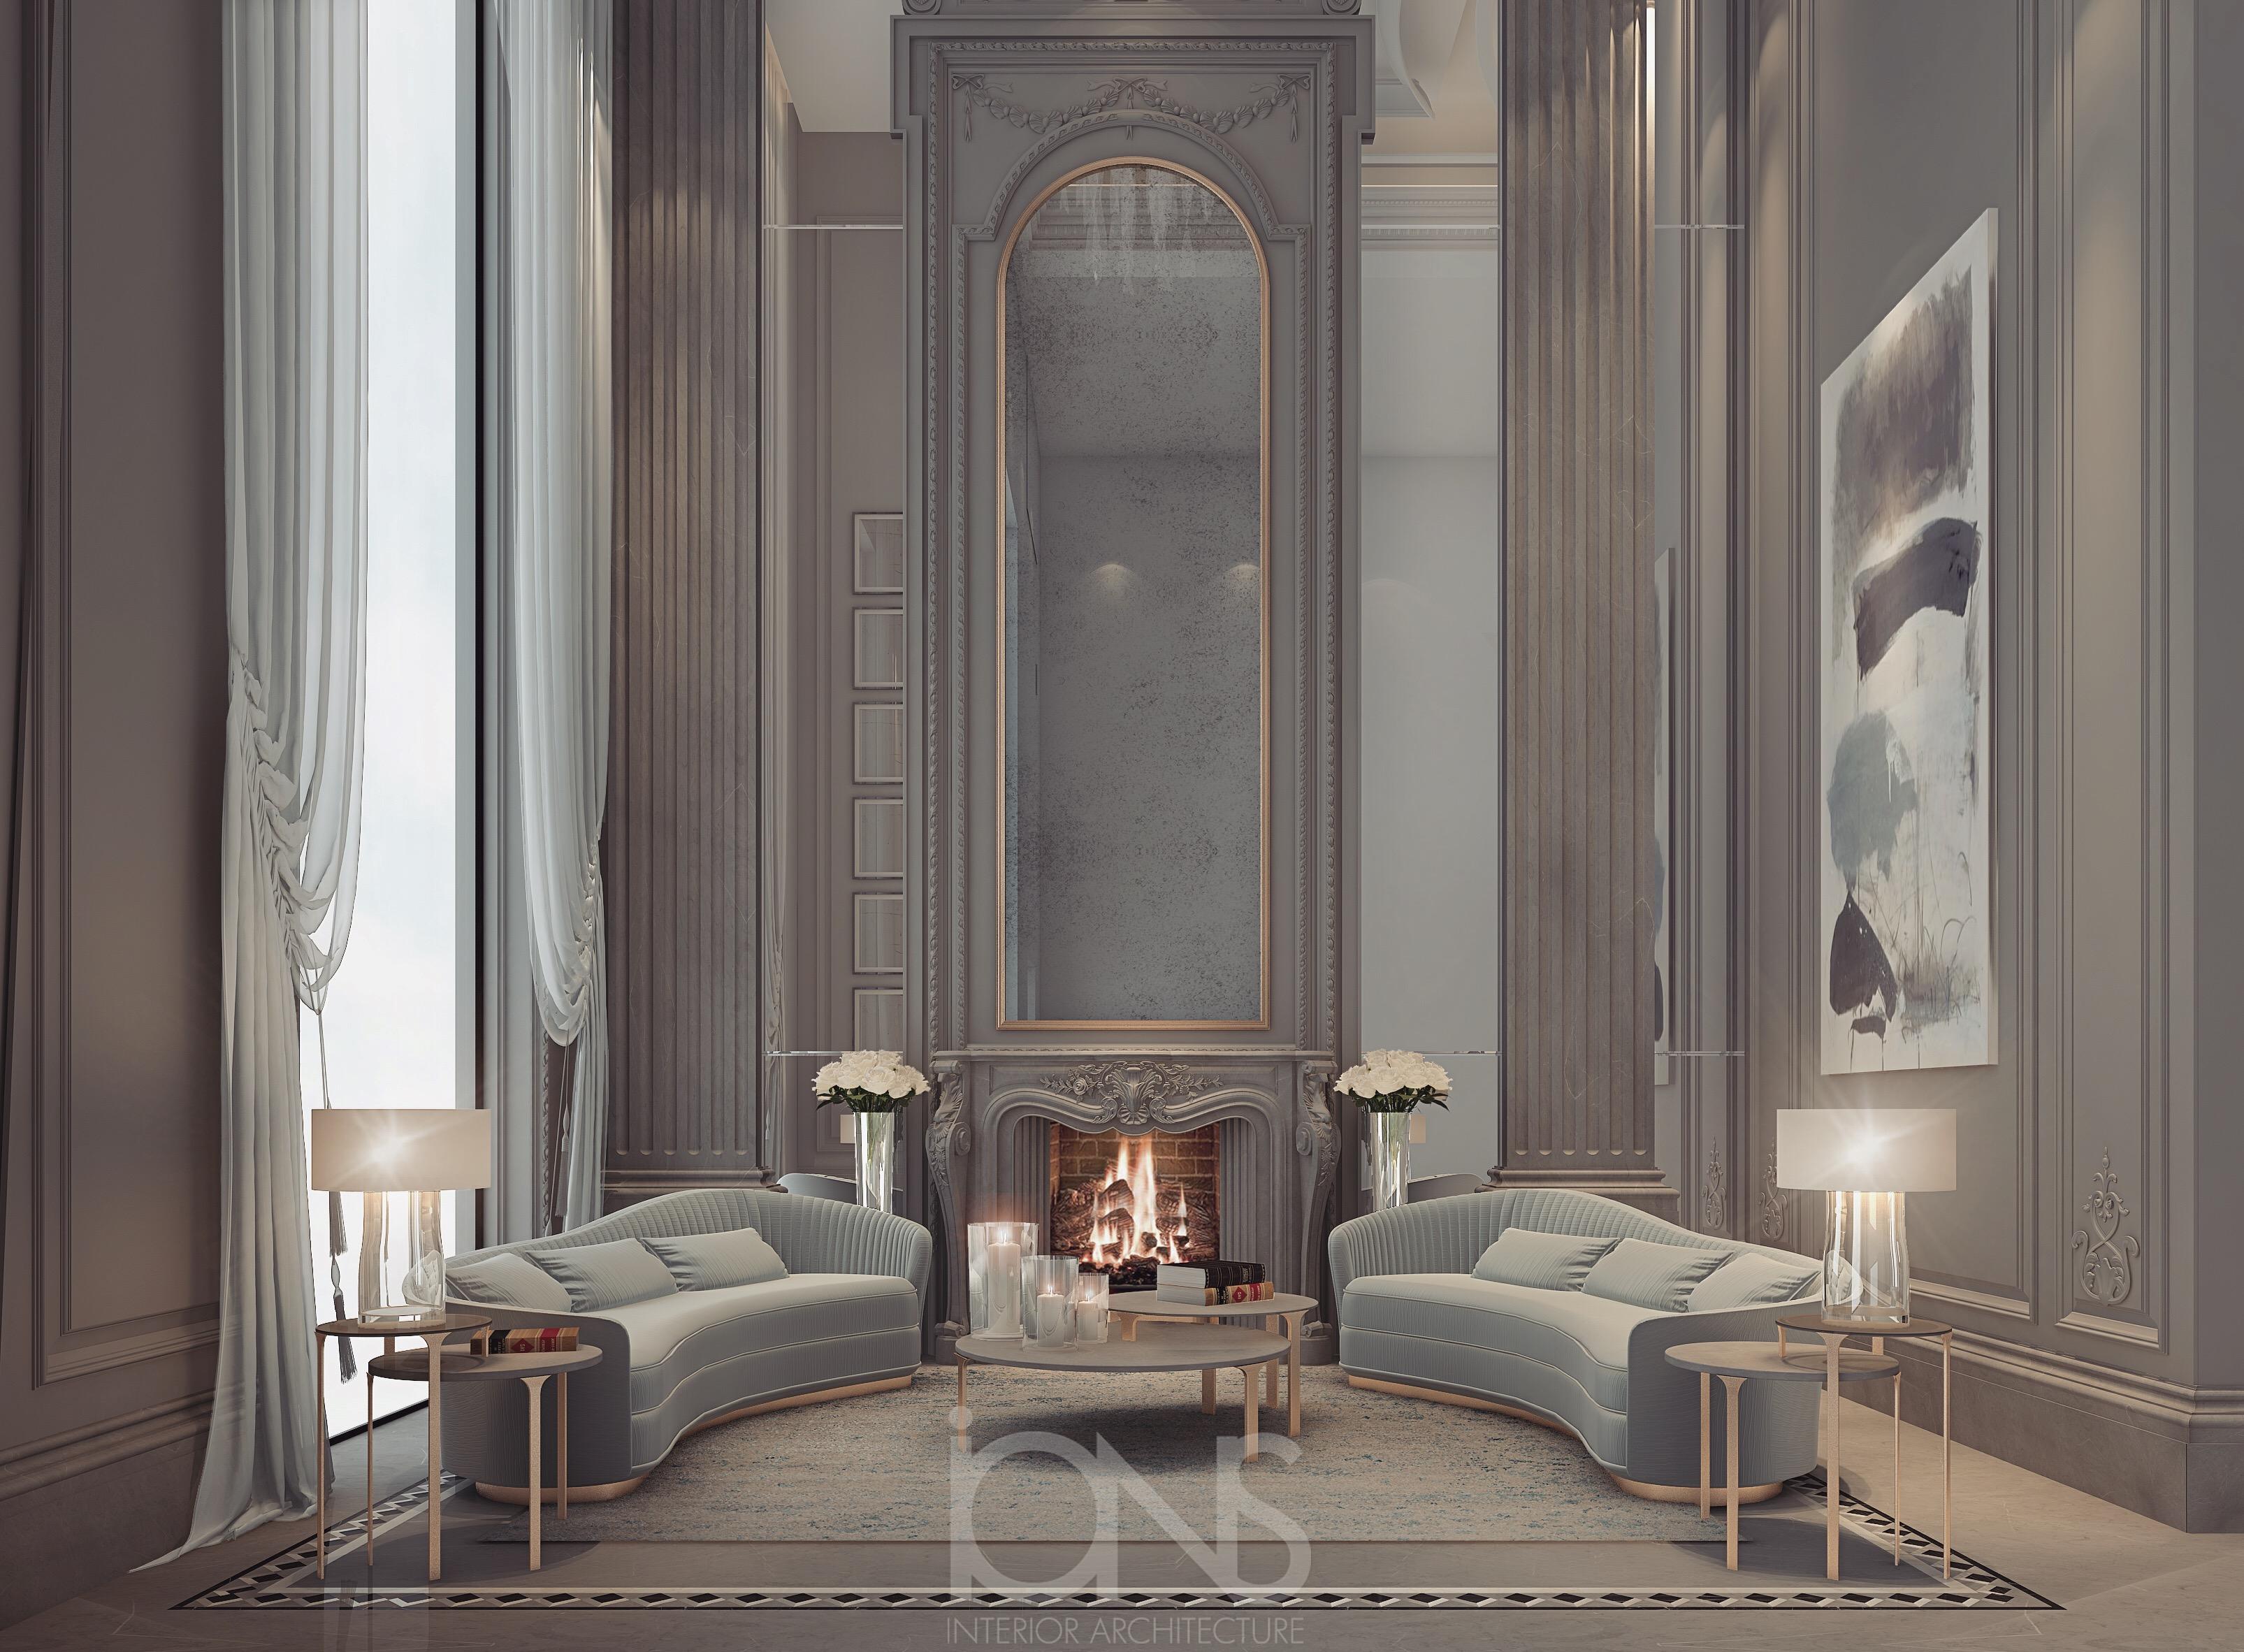 Renaissance Style Villa Design